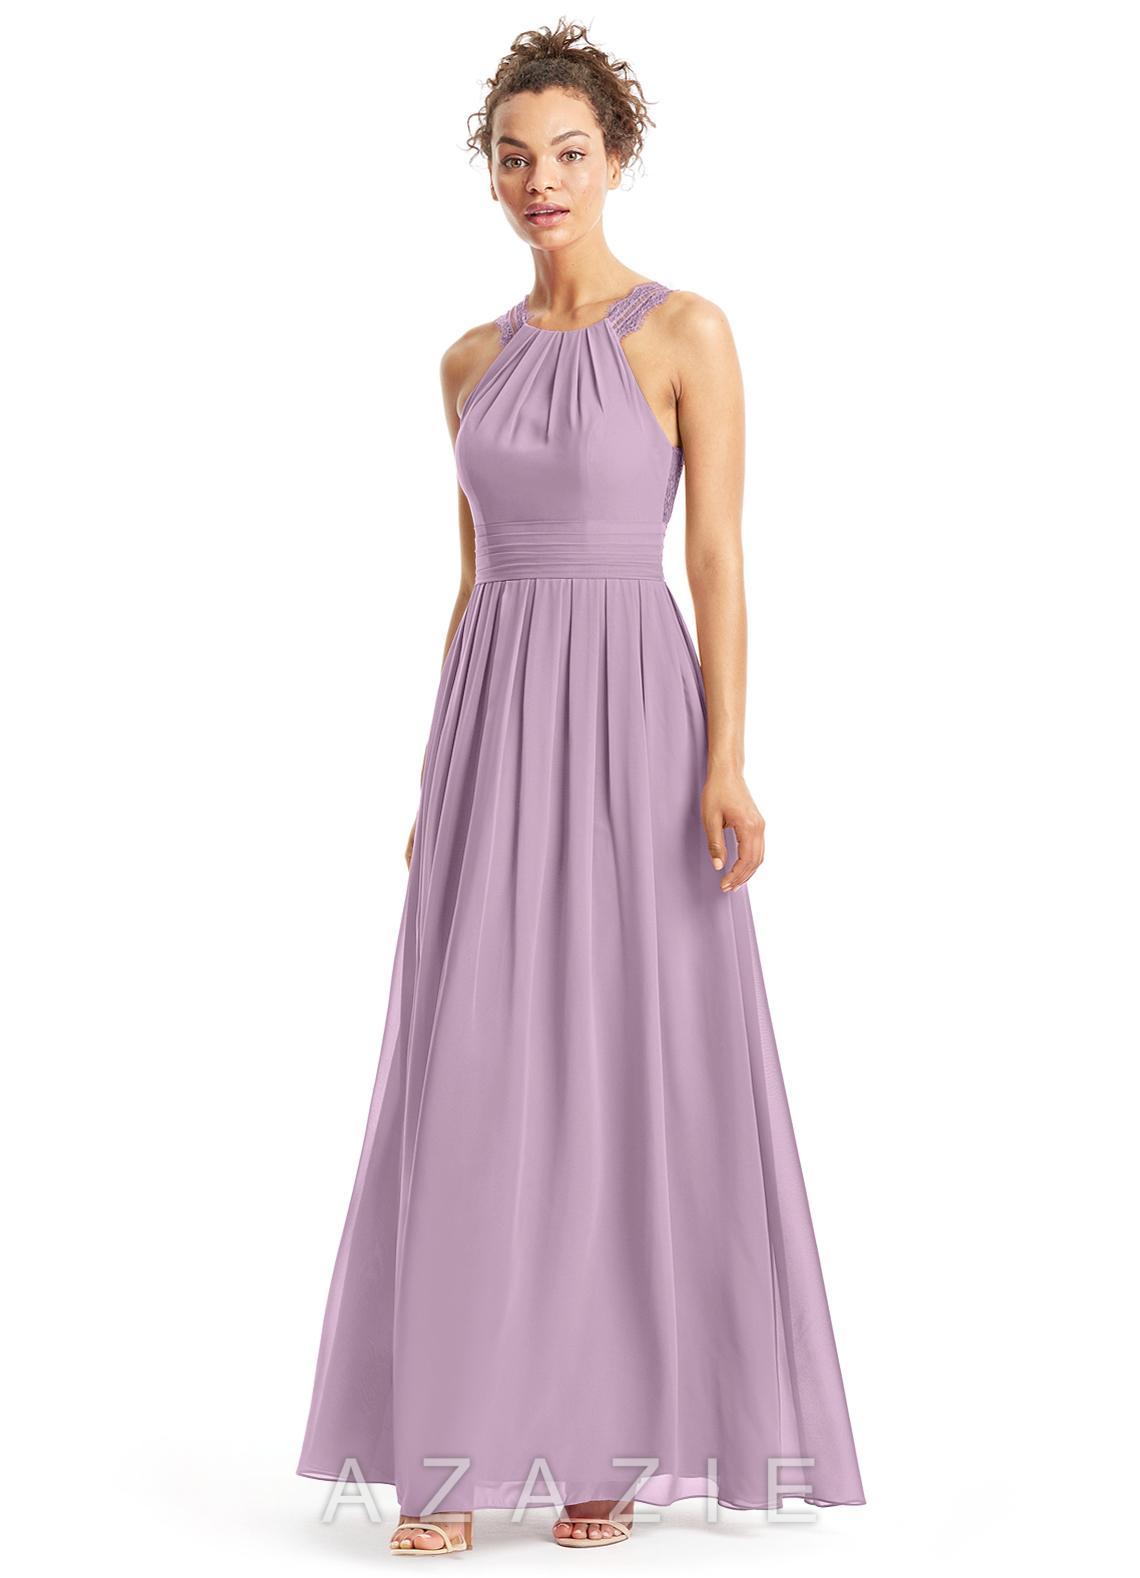 Azazie colleen bridesmaid dress azazie home bridesmaid dresses azazie colleen azazie colleen ombrellifo Images